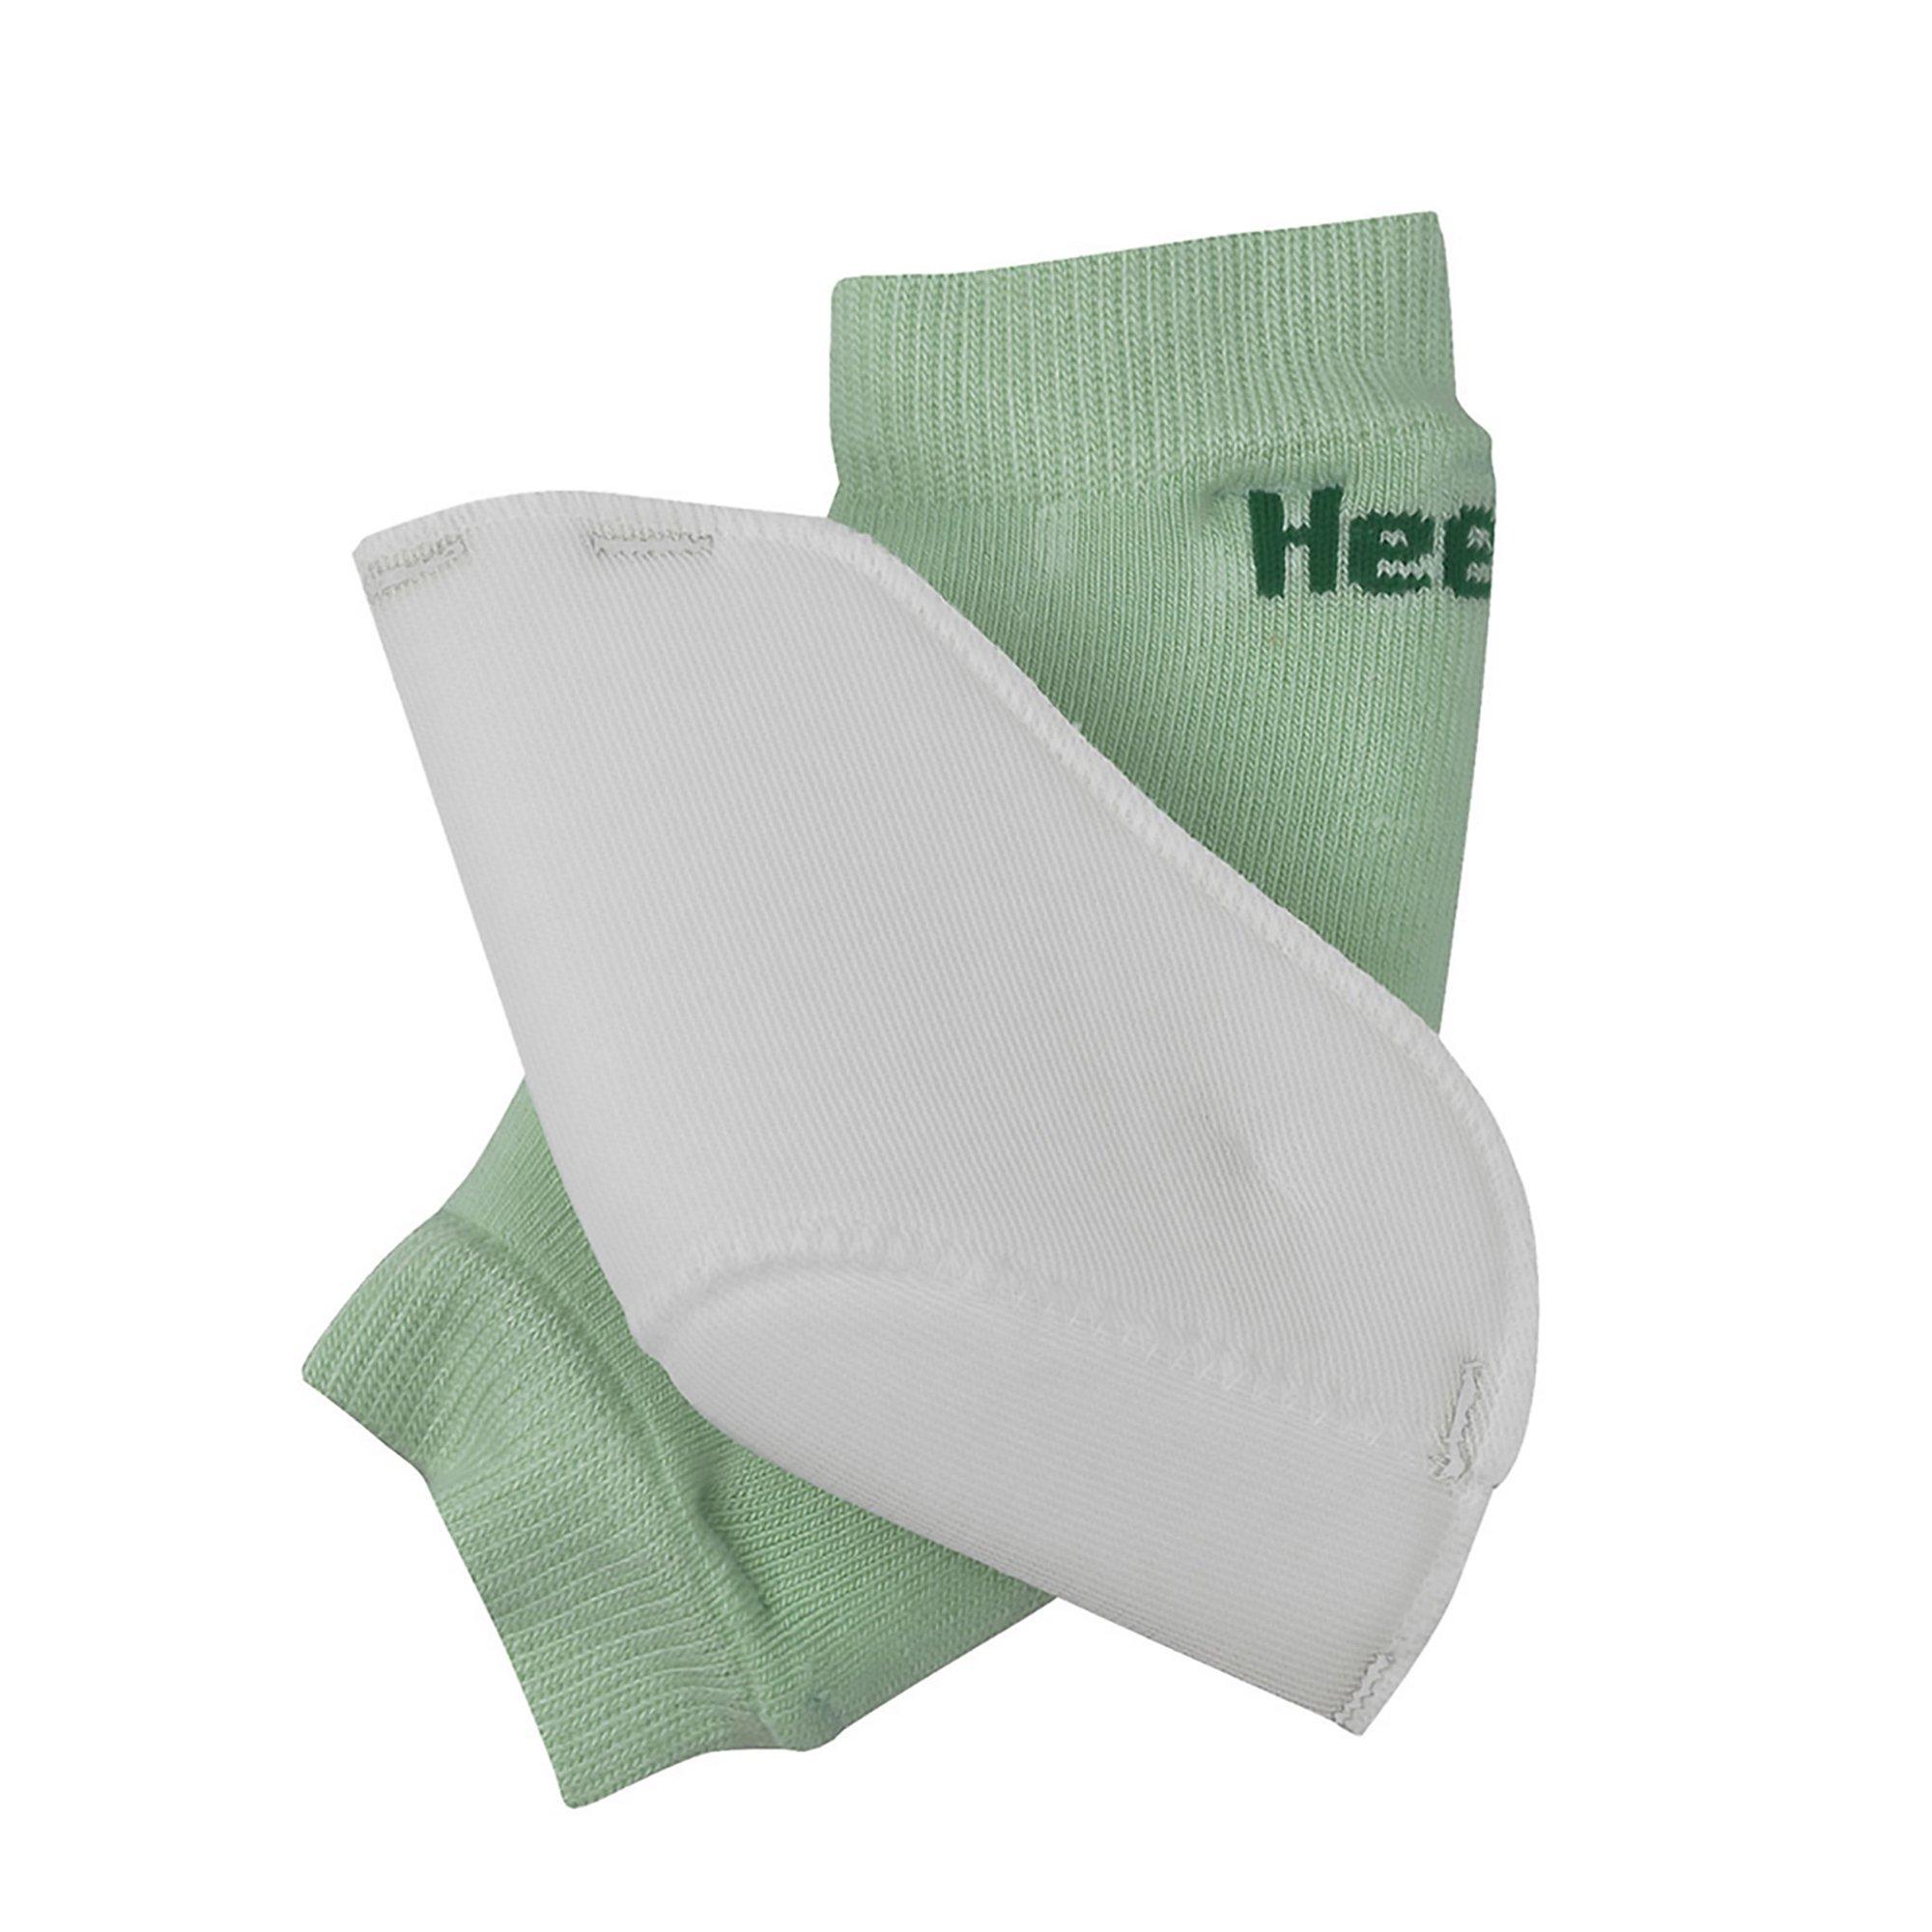 Heelbo Heel/Elbow Protection Sleeve , D 12040, Green X-Large - Case of 12